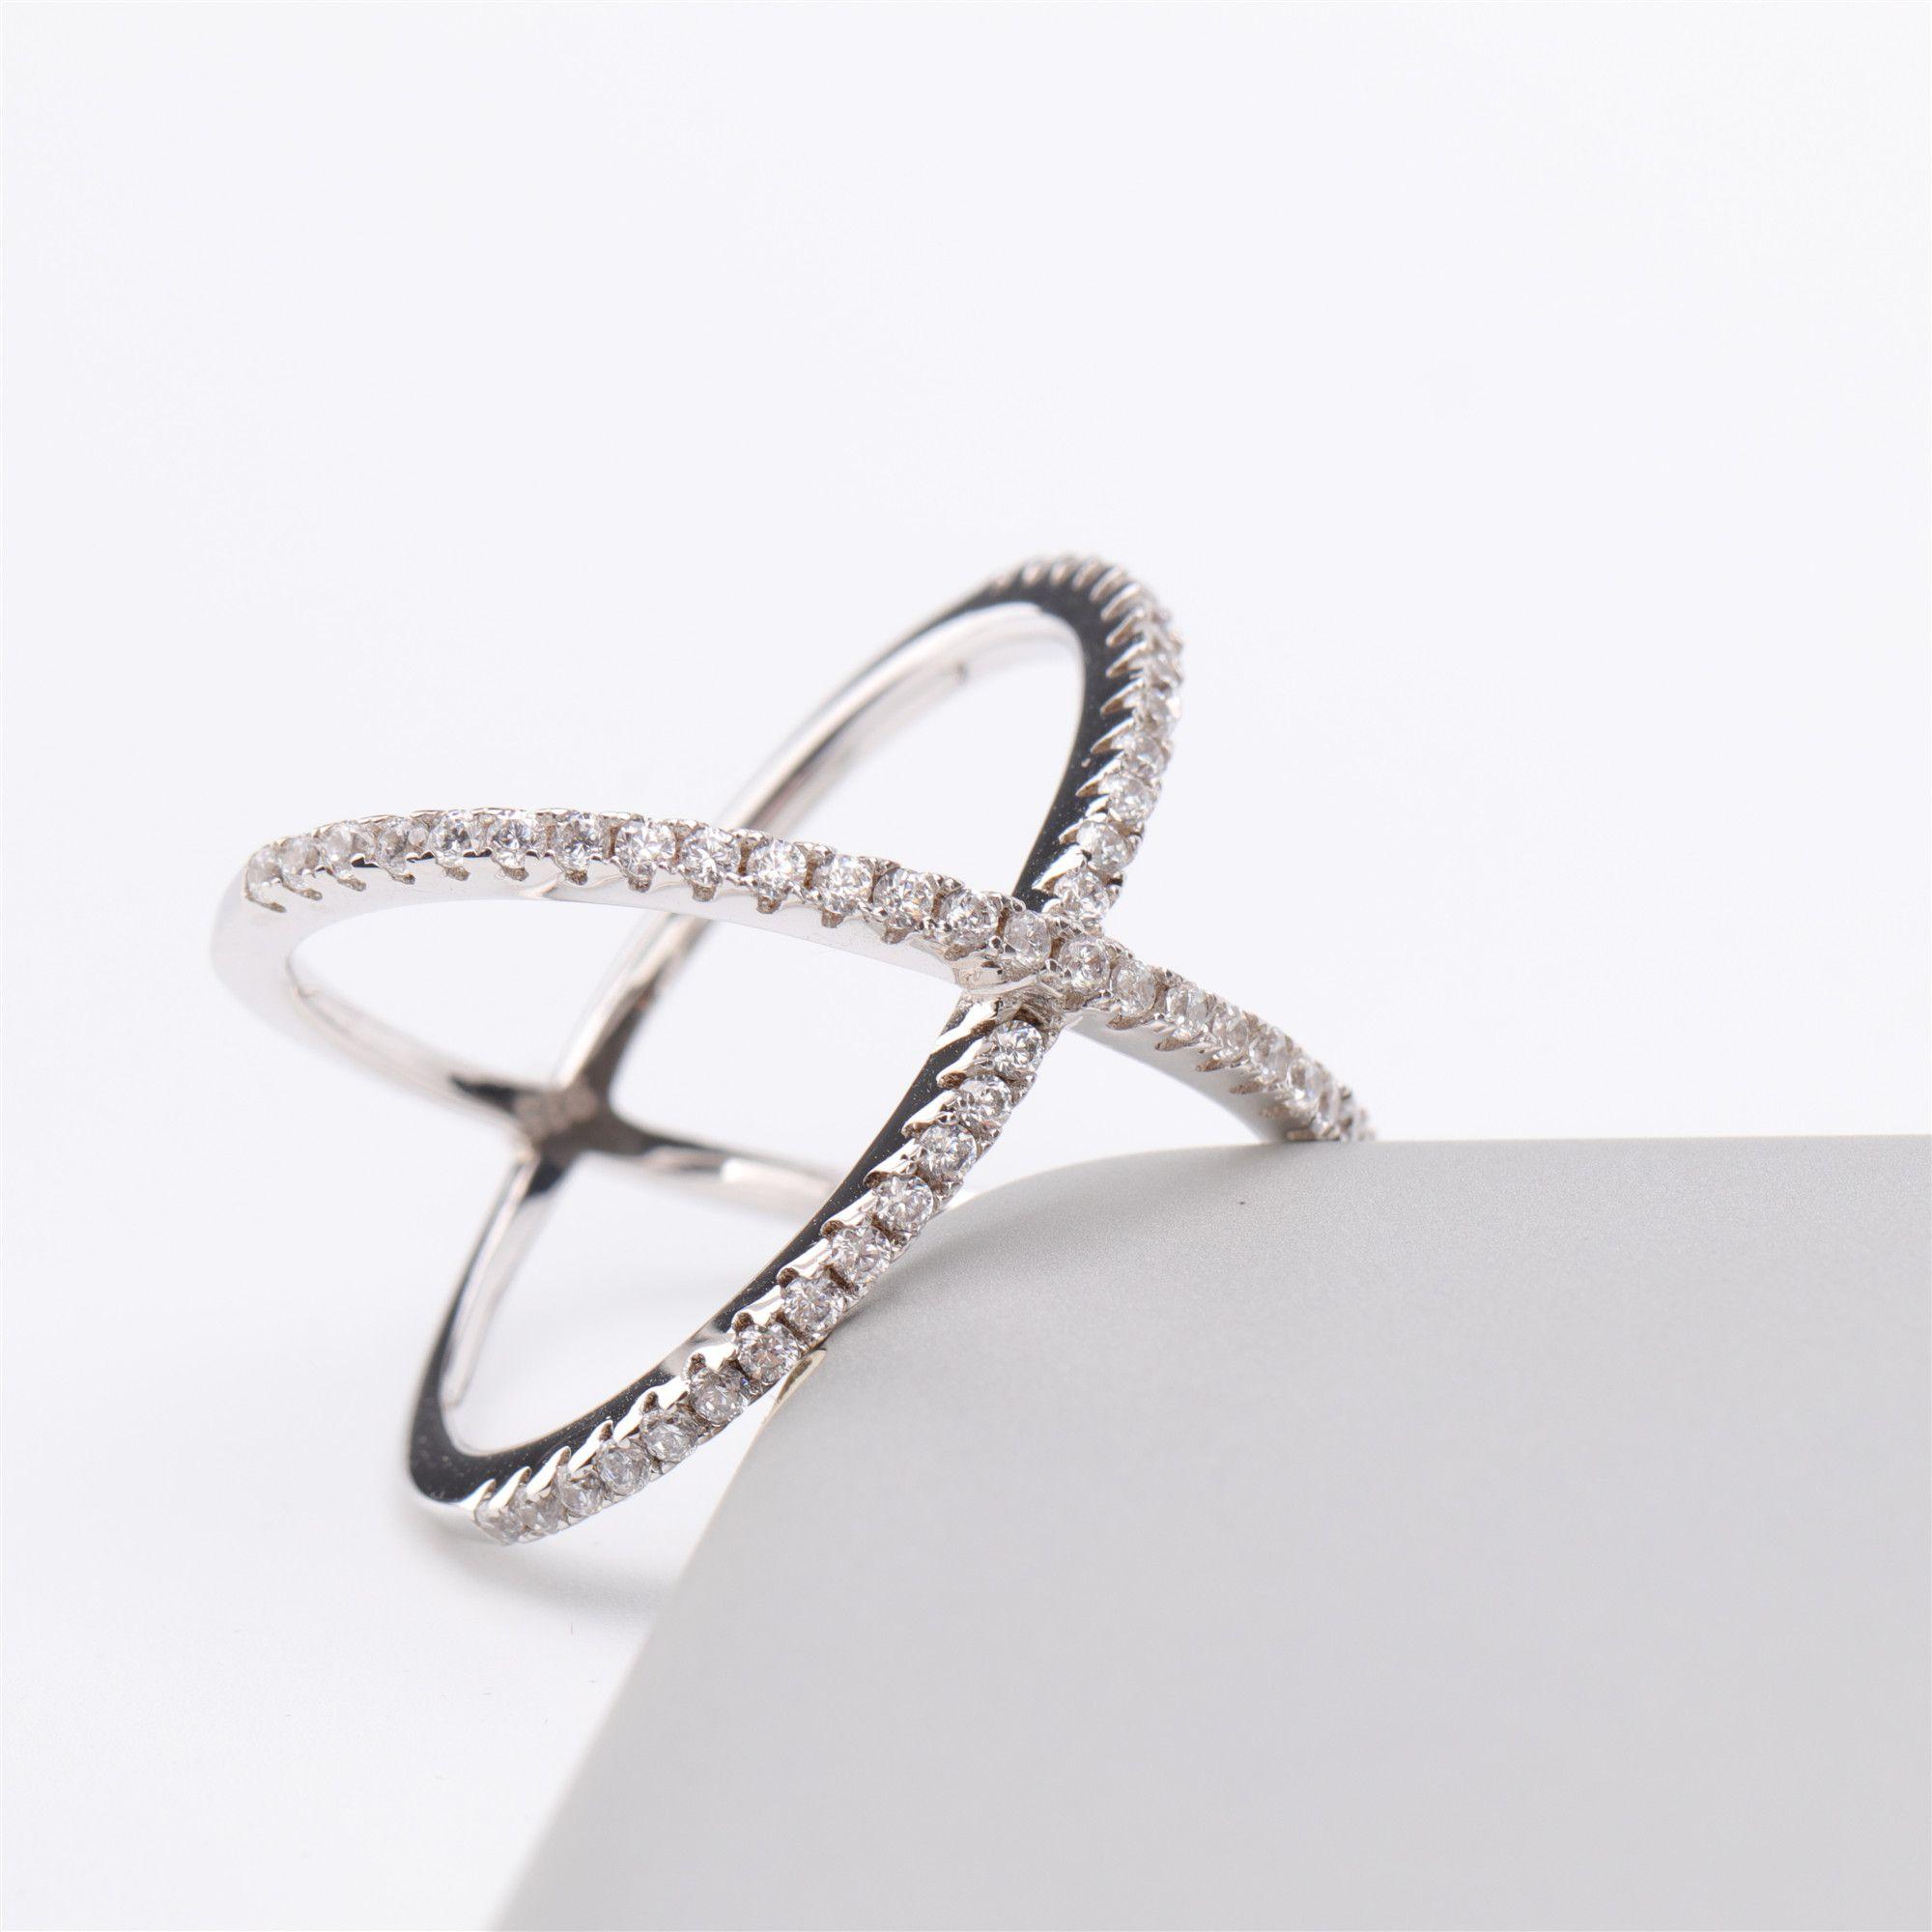 FB Jewels 925 Sterling Silver Mens Women Baguette CZ Cross Charm Religious Pendant